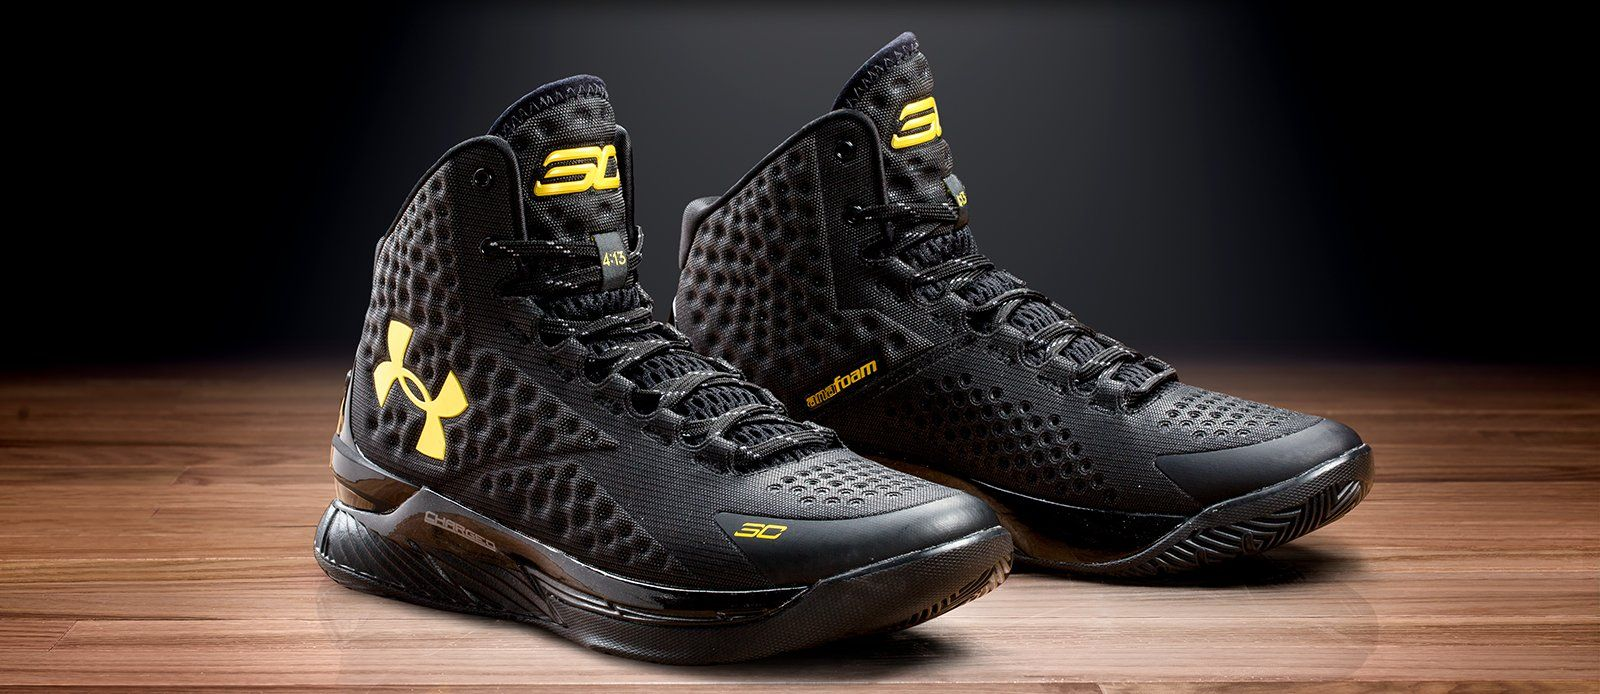 Sick Basketball Shoes